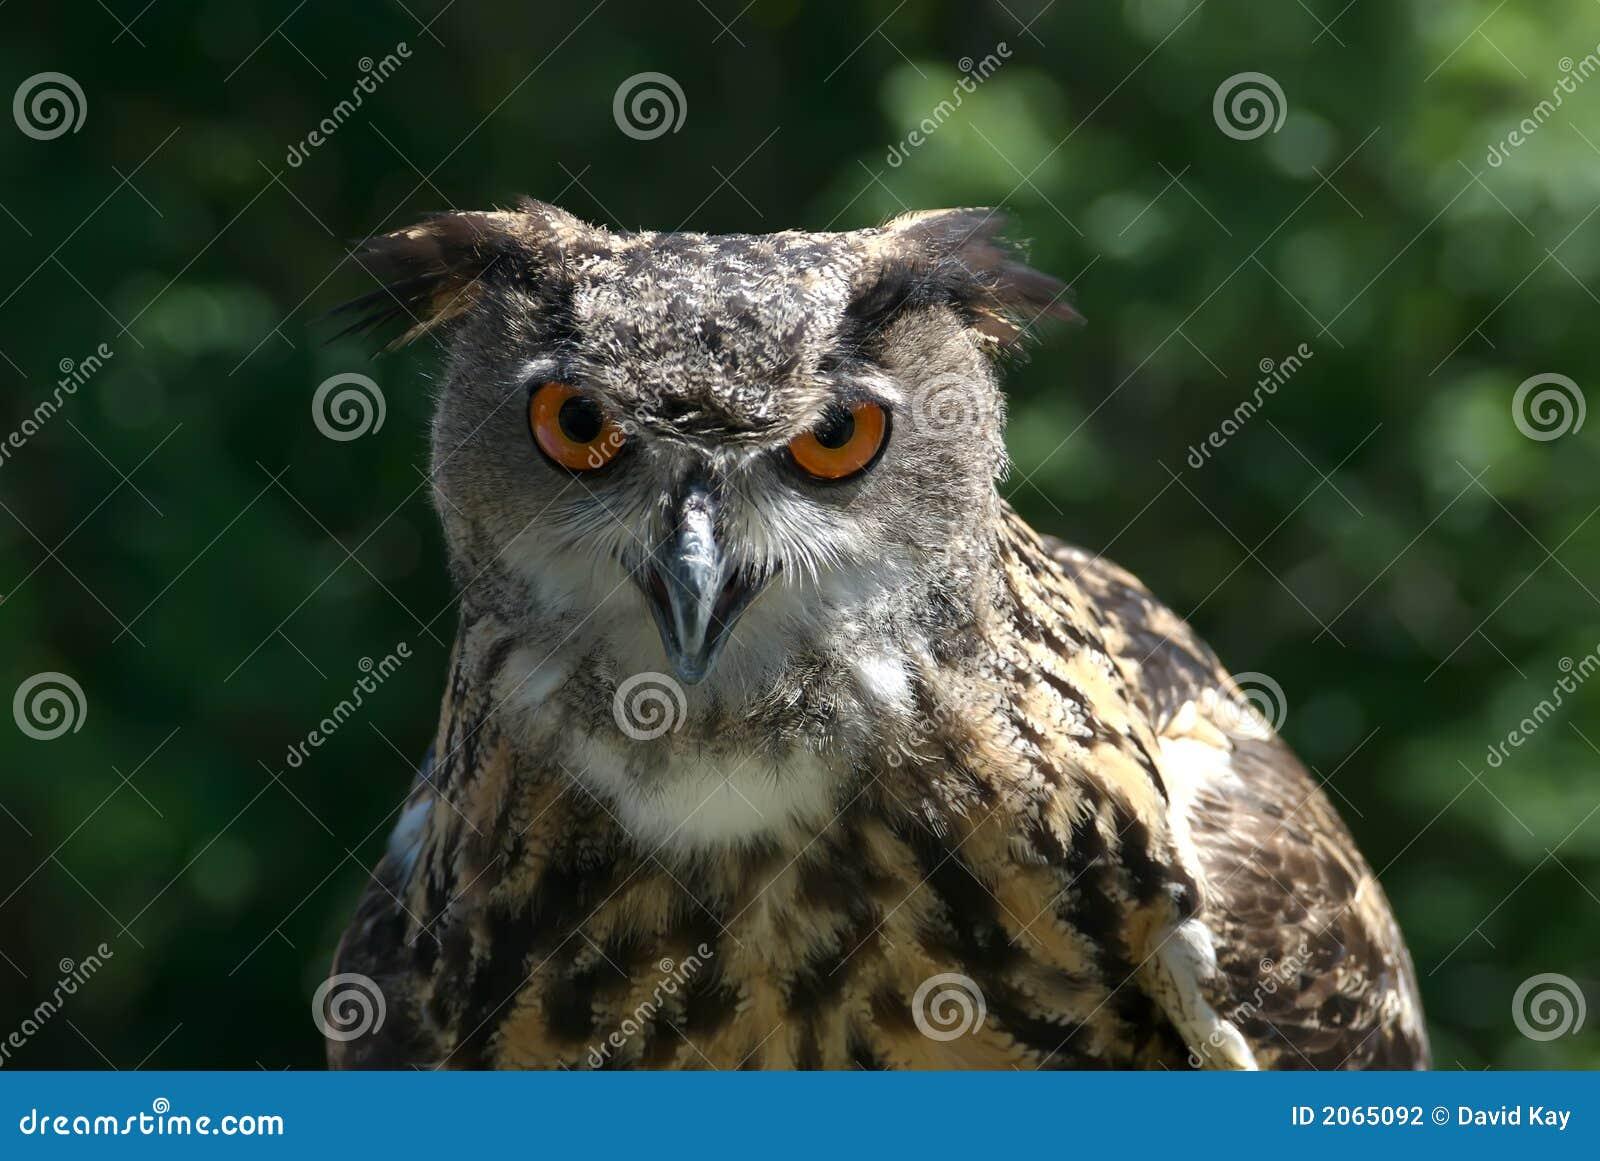 Wisdom Stock Photo Image Of Feathers Symbols Determination 2065092